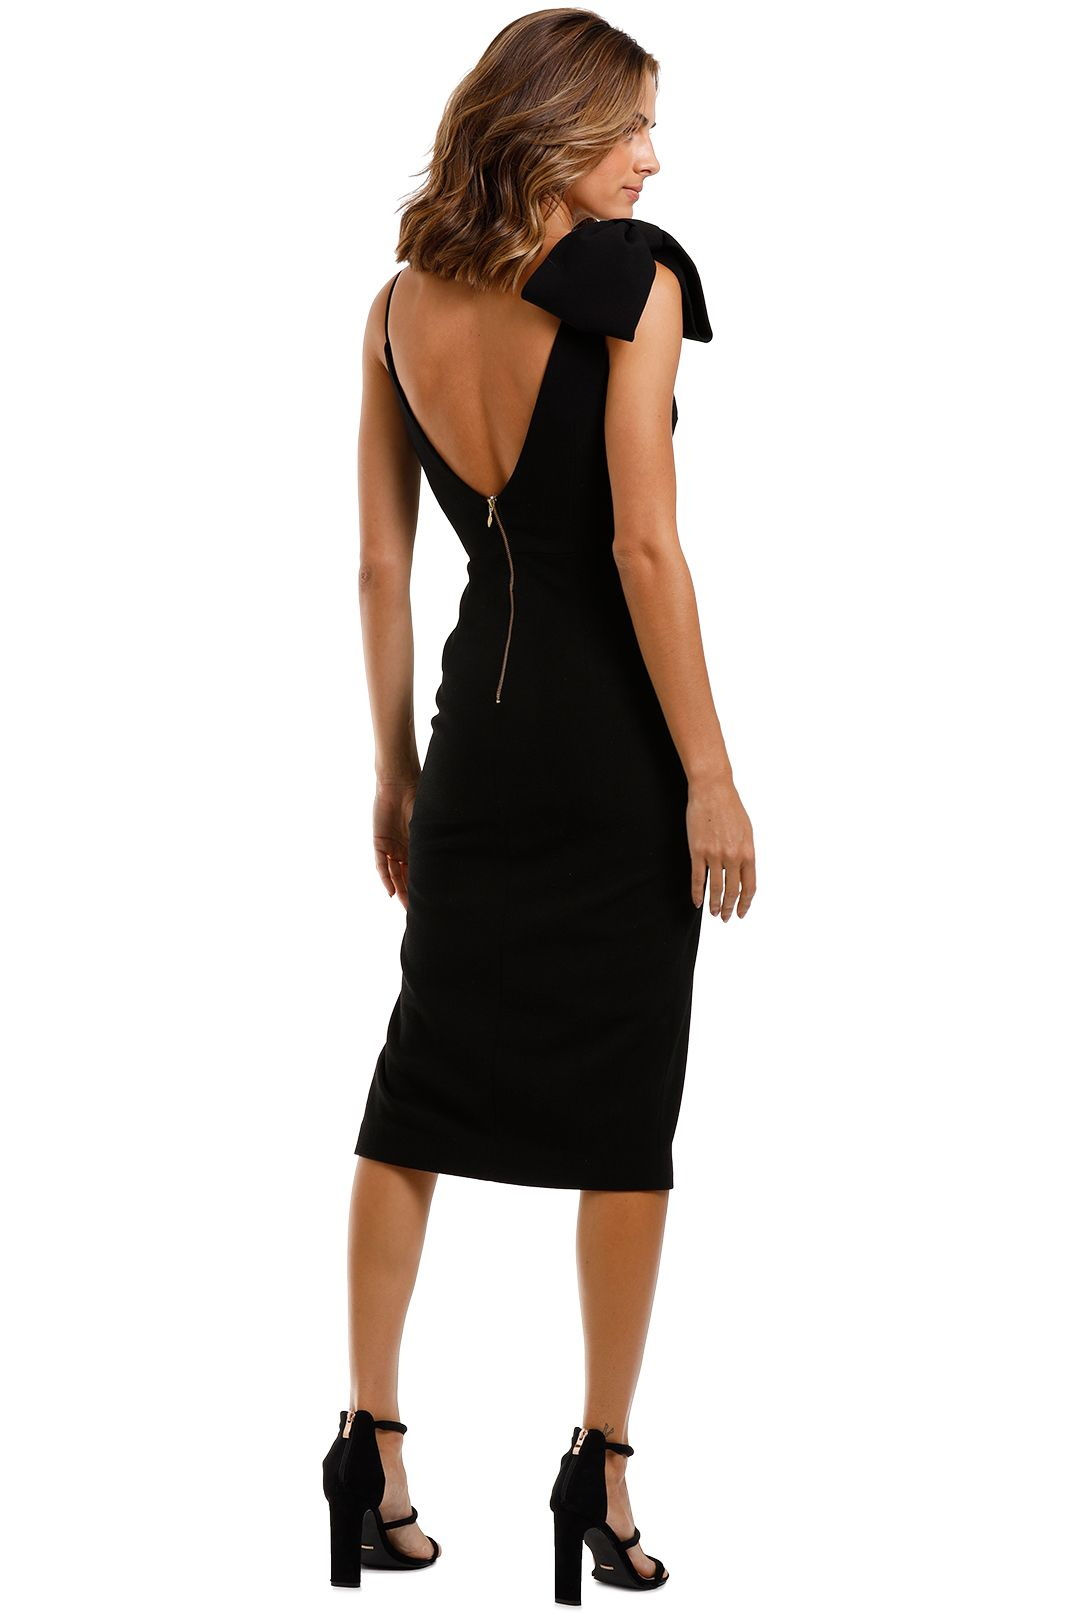 Rebecca Vallance Love Bow Dress Black Side Split